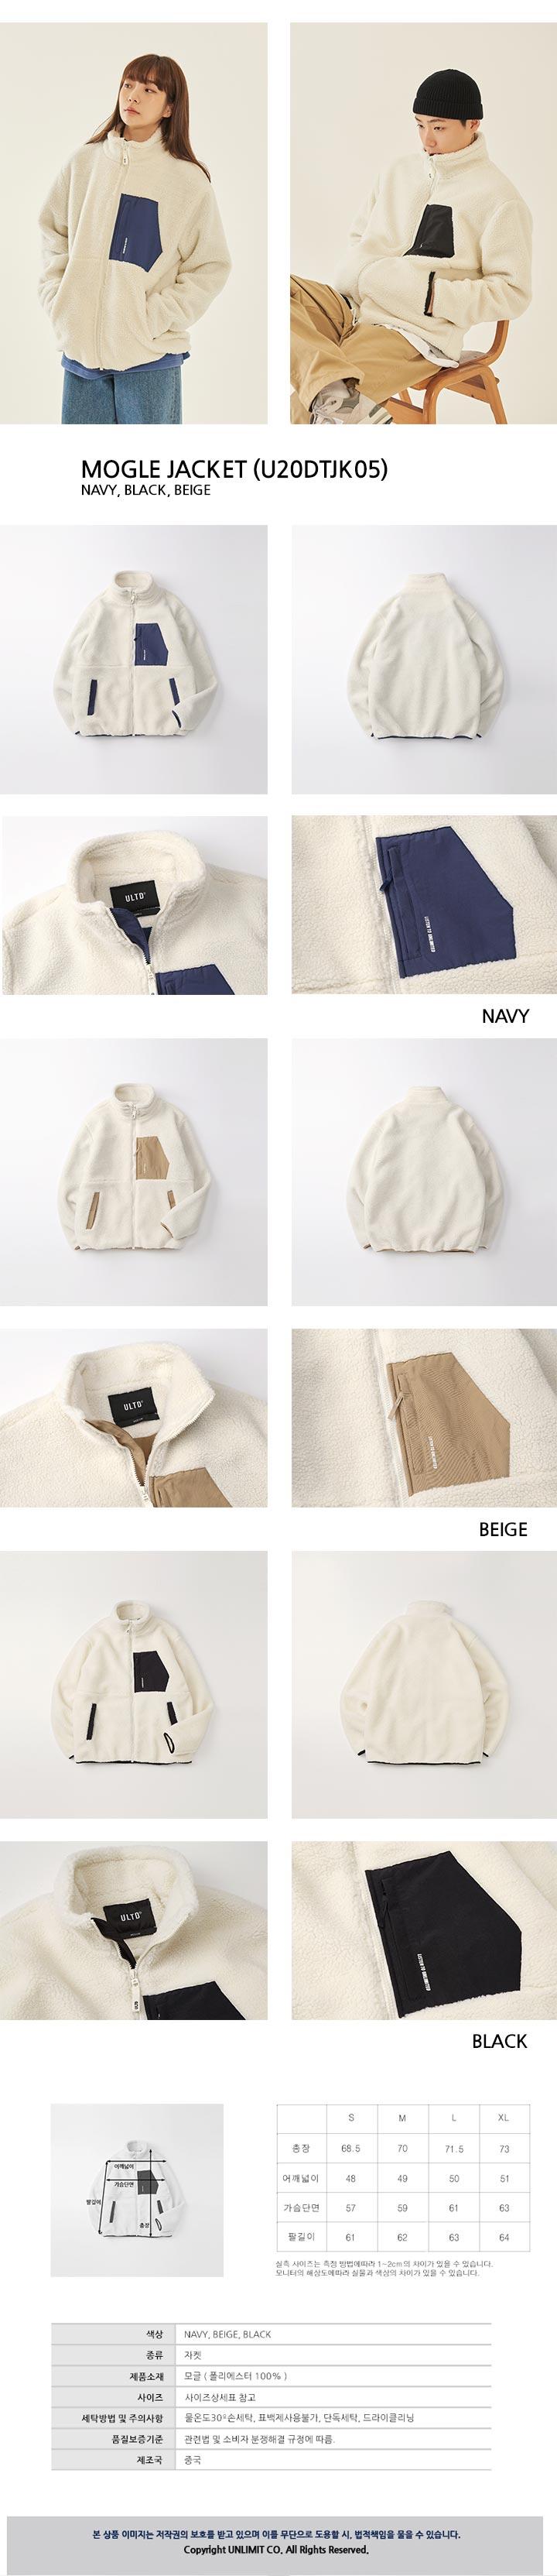 Mogle-Jacket-(U20DTJK05).jpg